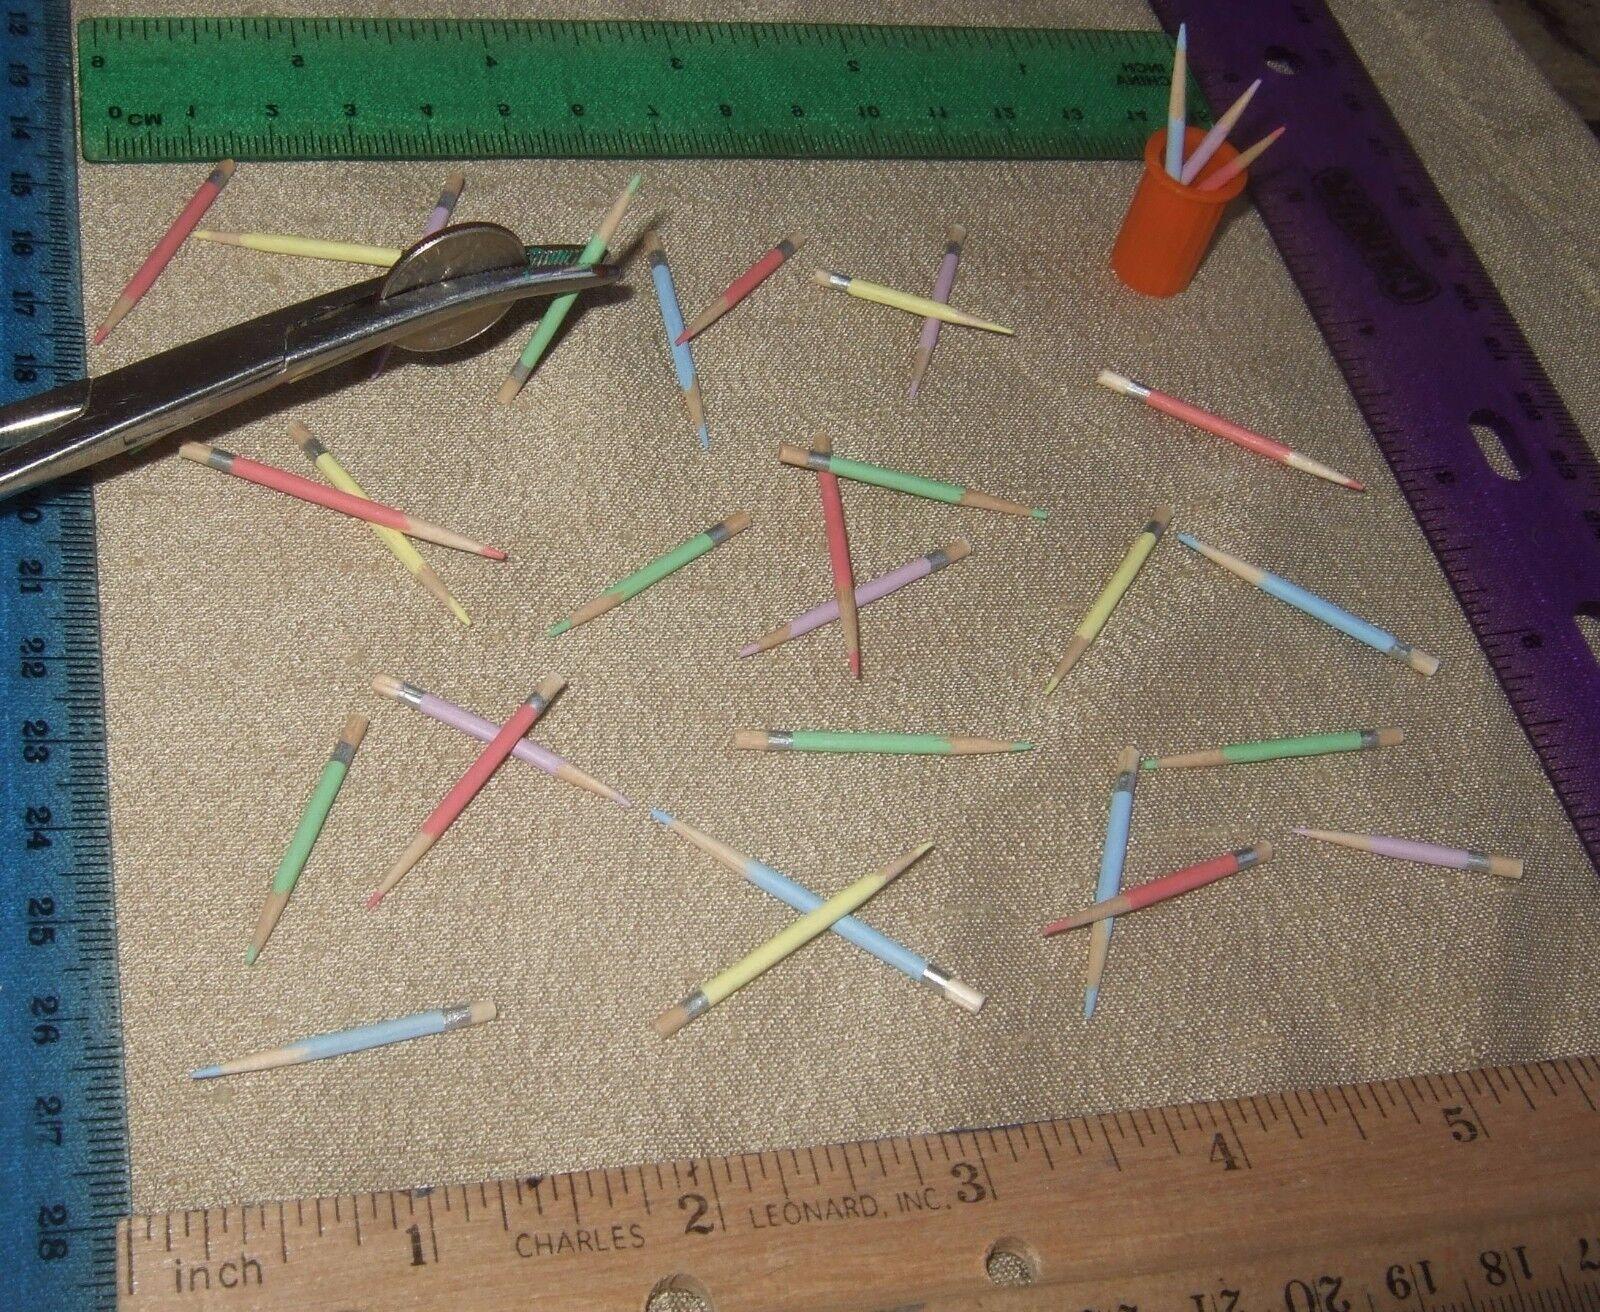 MINIature DollHouse Barbie Scrapbook CRAFTS School Farbe Pencils 1  Sc LOT 400